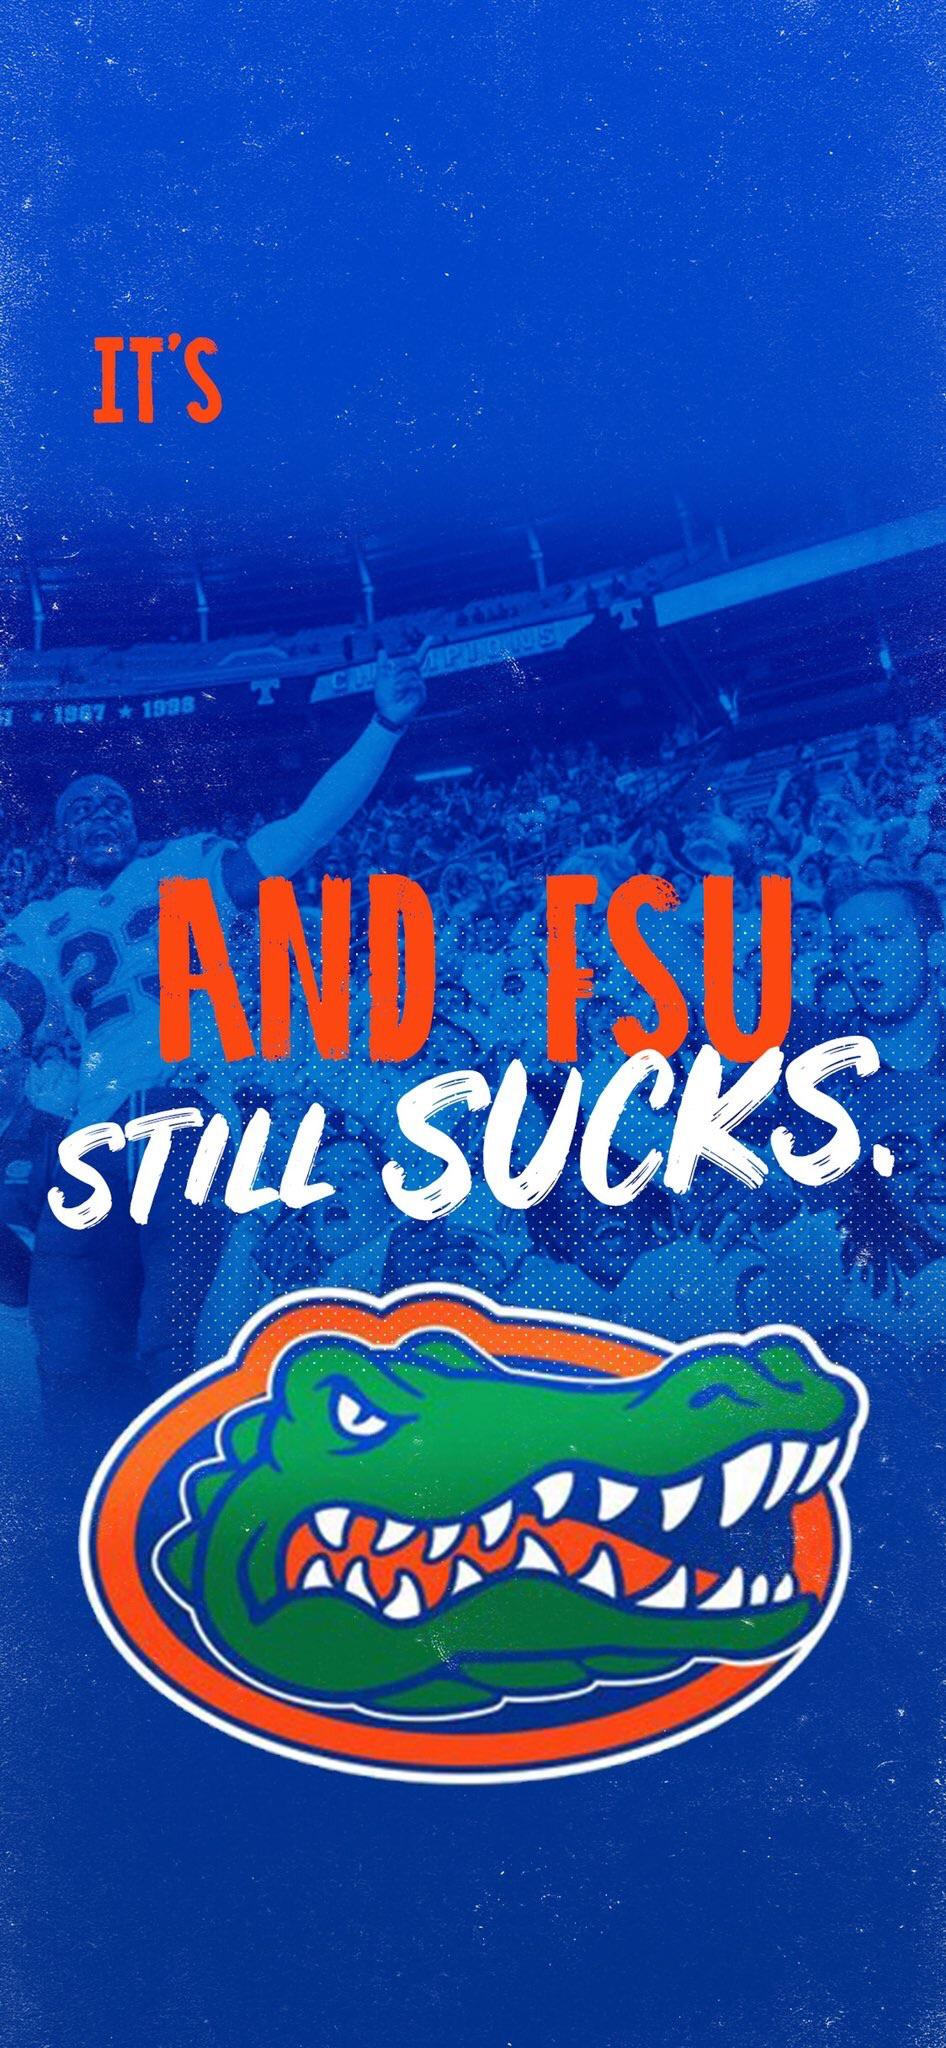 Florida Gators Wallpapers - Top Free